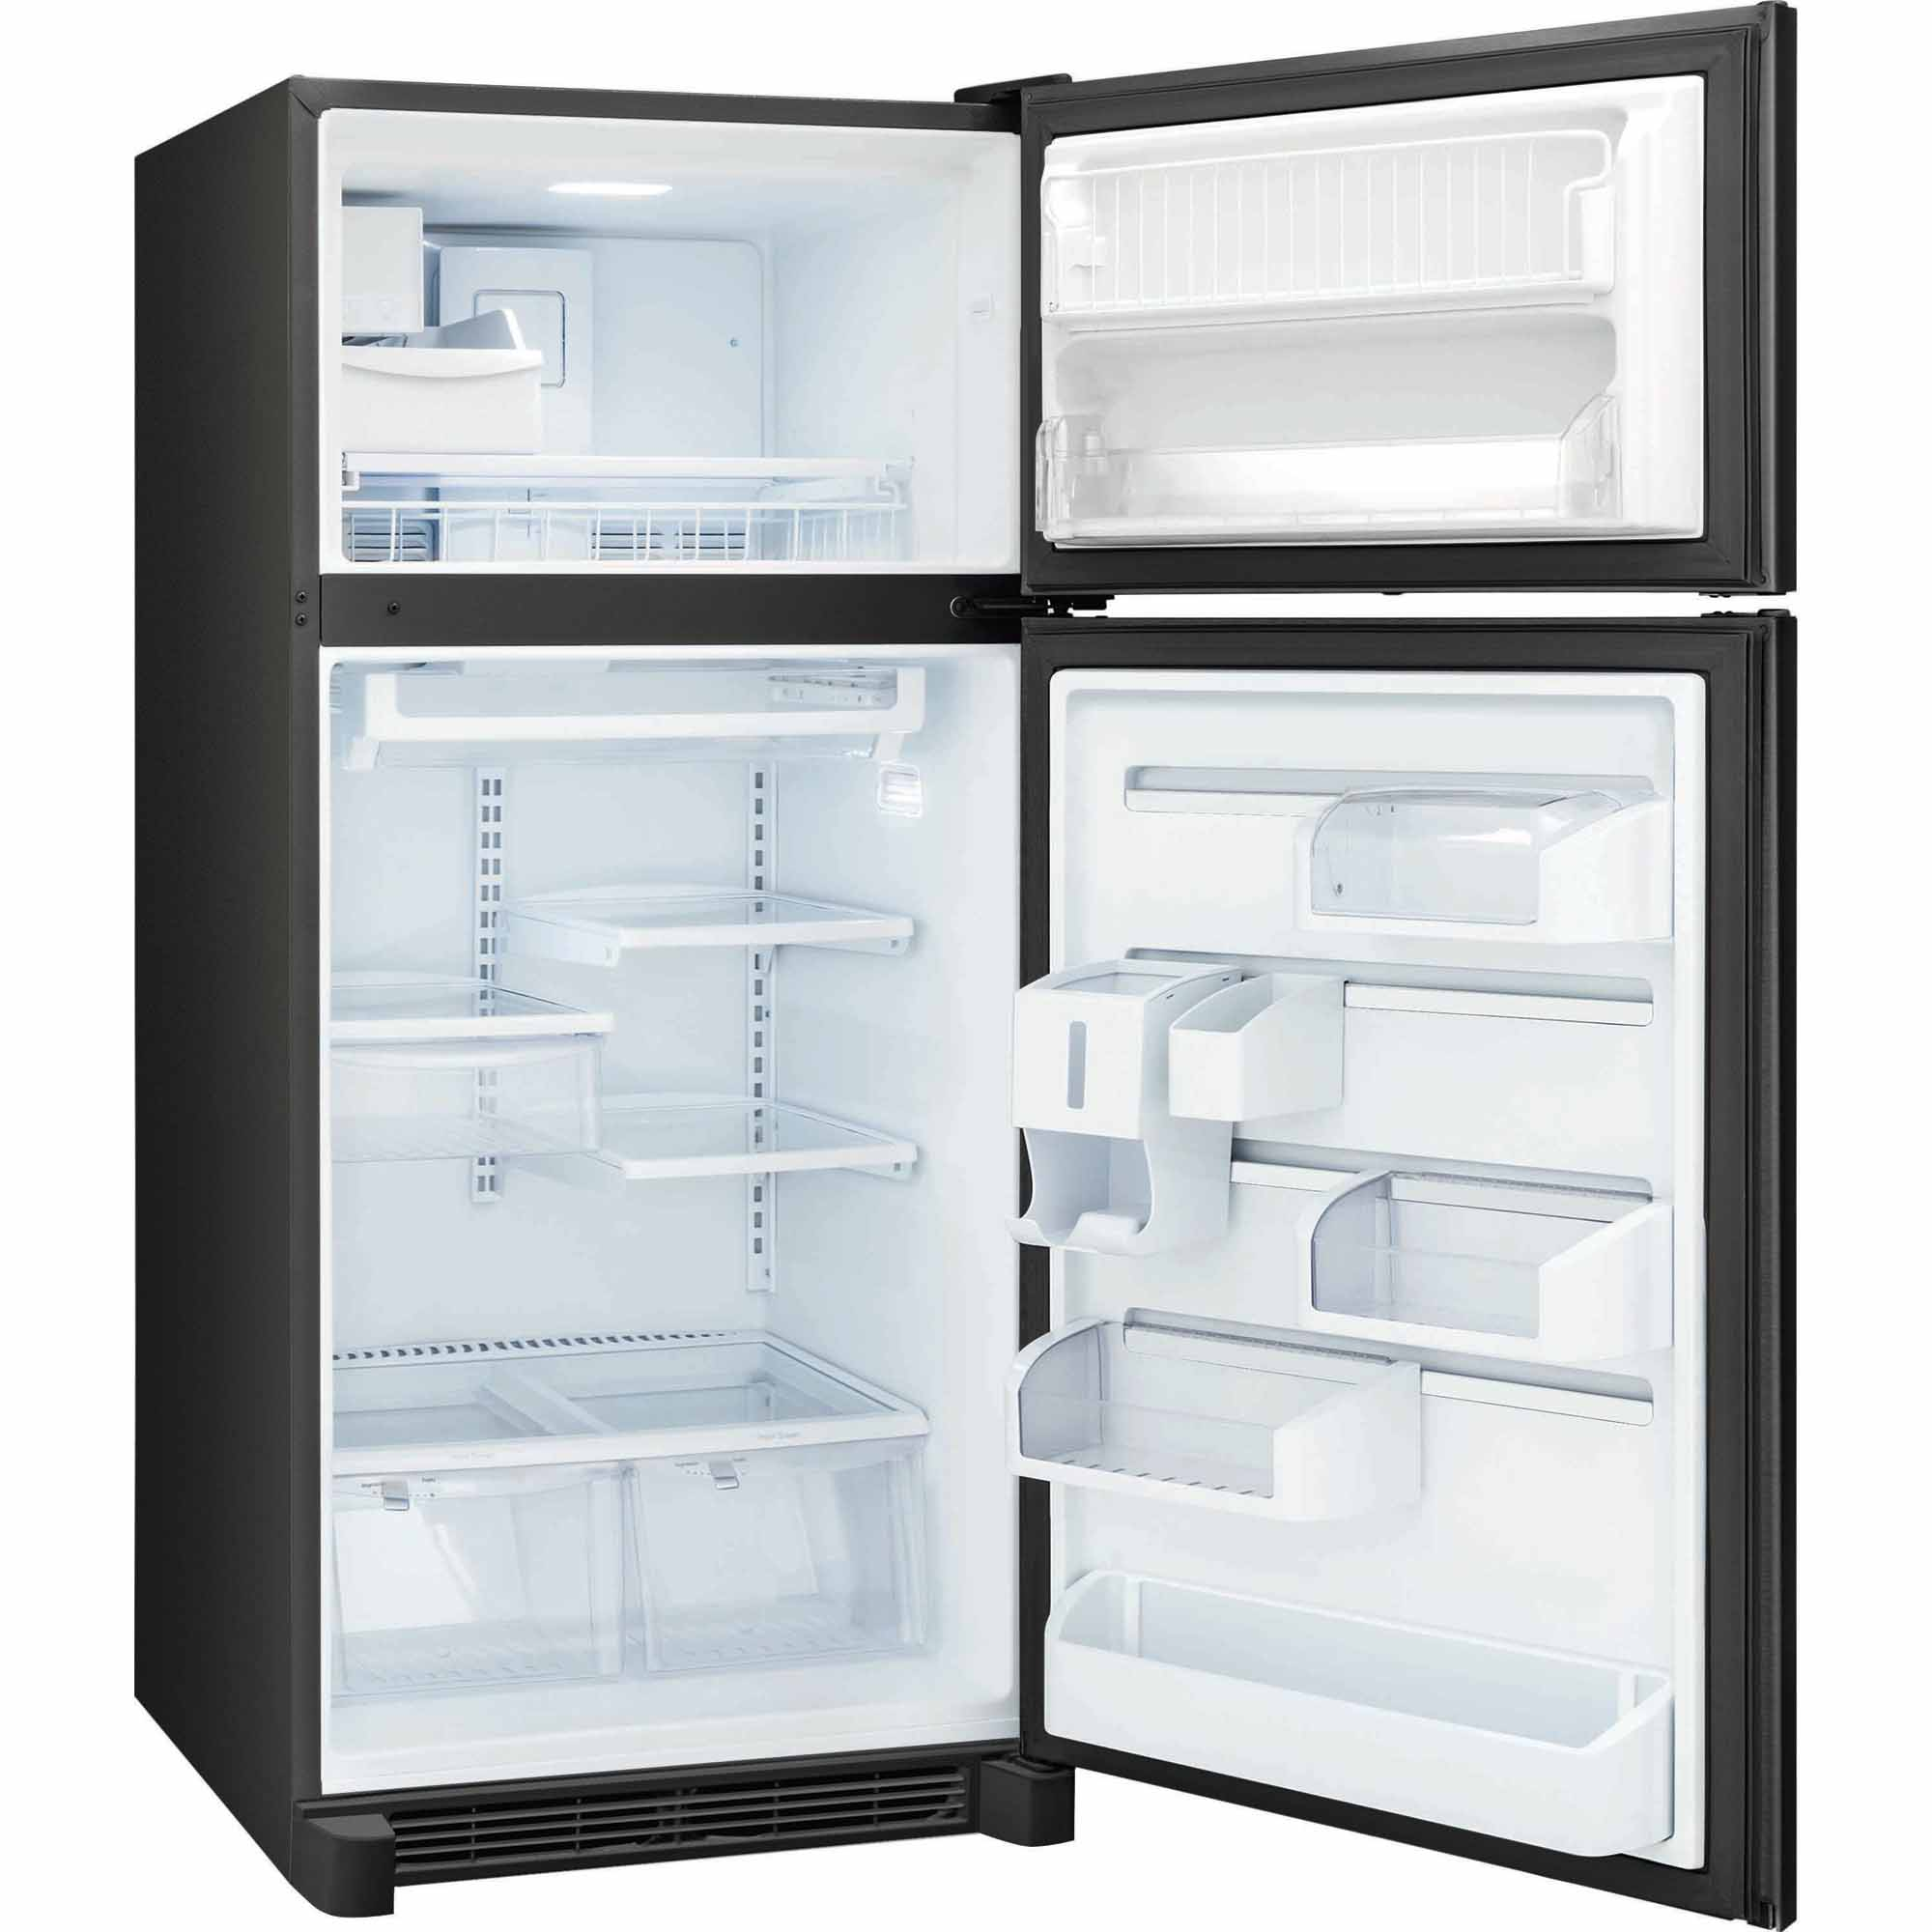 Frigidaire Gallery FGHI2164QE 20.5 cu. ft. Top Freezer Refrigerator - Black